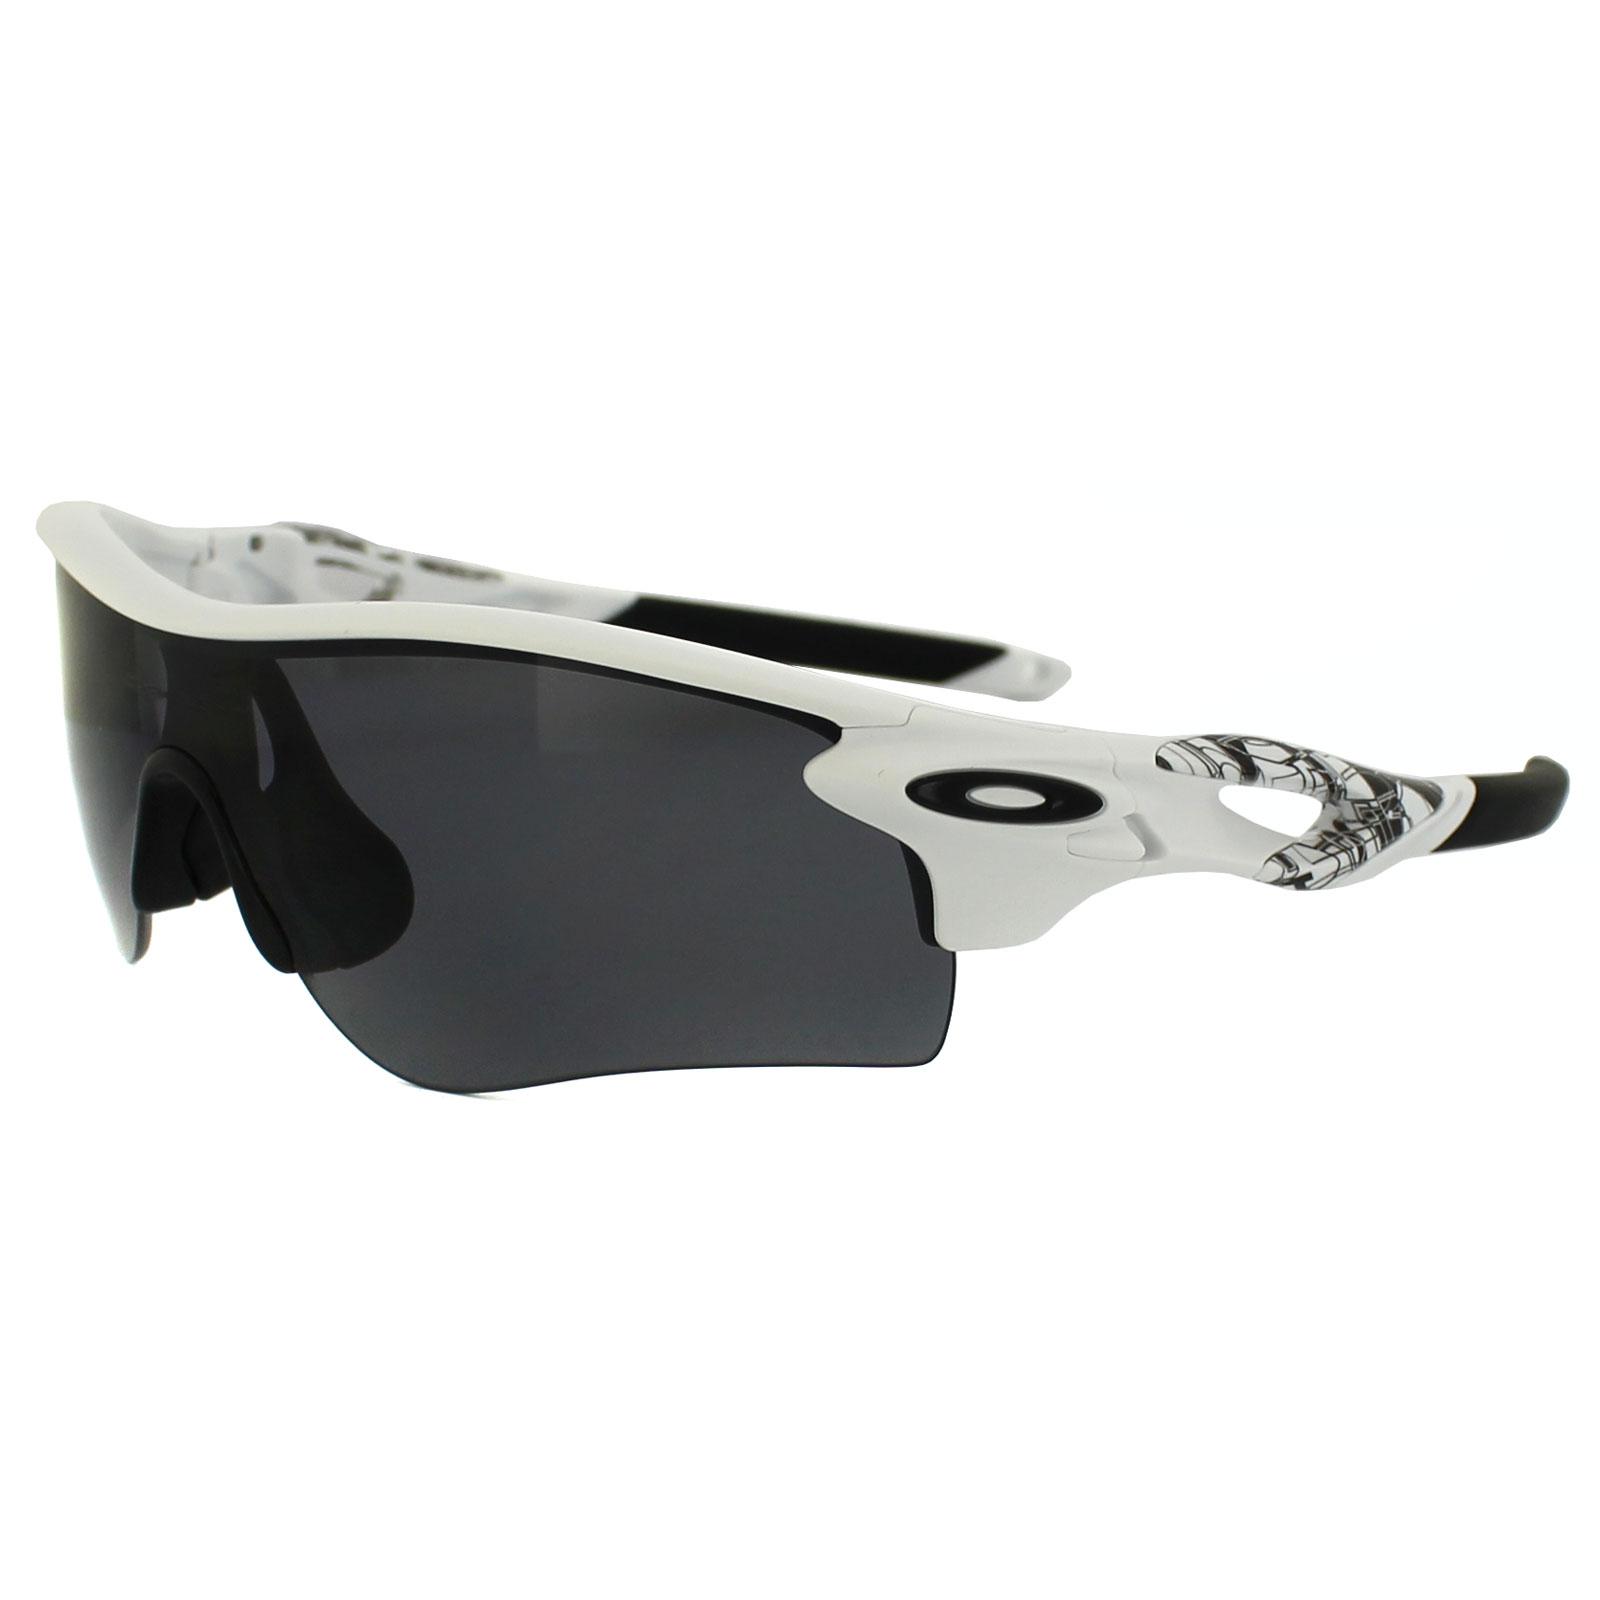 oakley radarlock polarized ot5o  Oakley Sunglasses Radarlock Path 9181 20 Matte White Grey Polarized VR28  Black  eBay